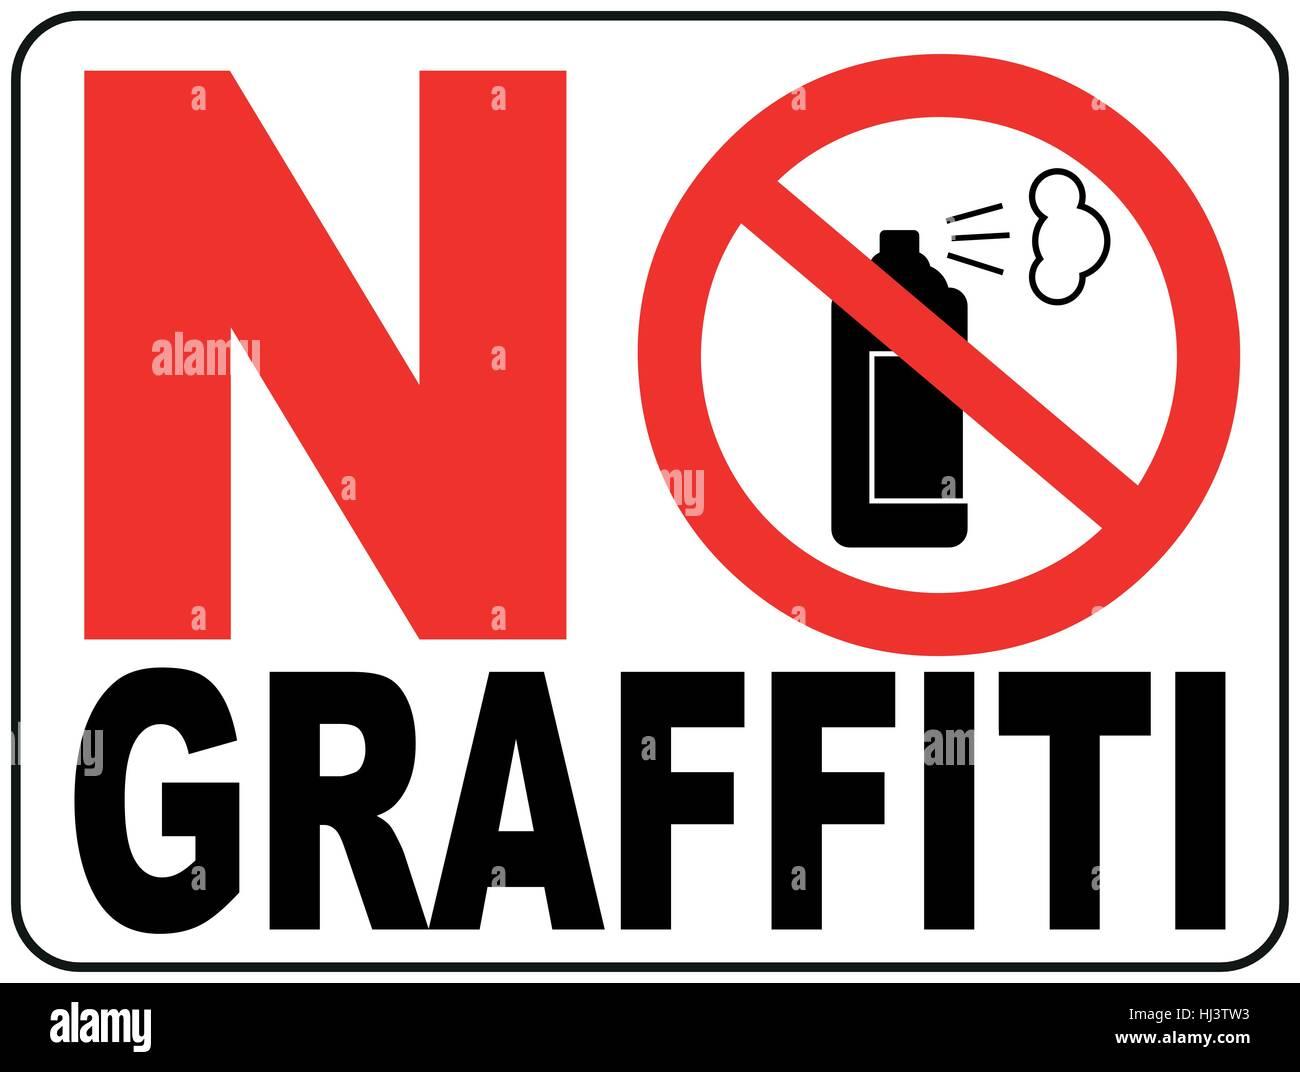 No graffiti symbol No aerosol spray sign, No alcohol sign vector illustration, red prohibition circle, for wall, - Stock Vector